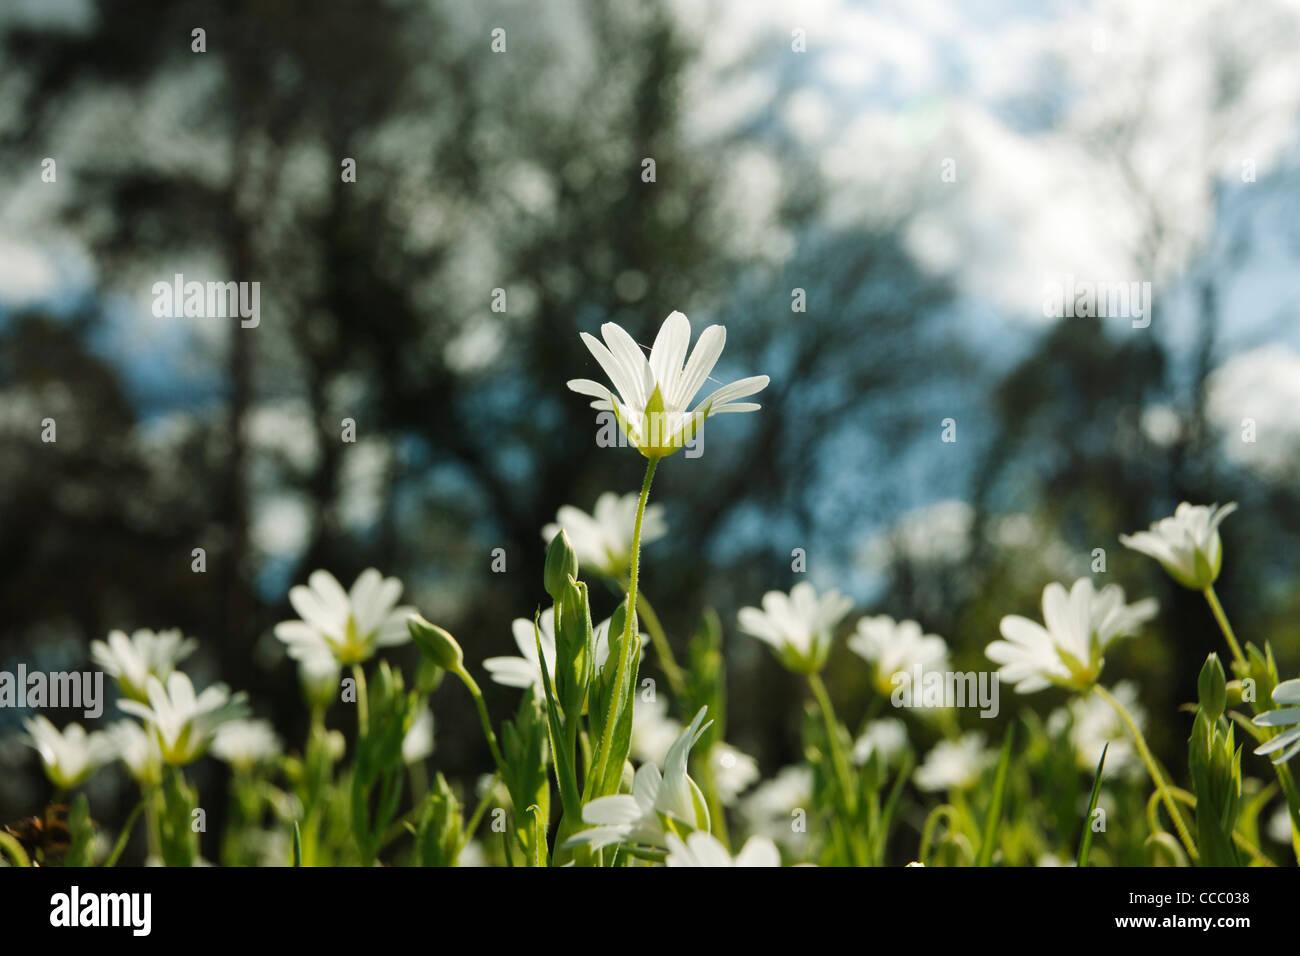 Greater Stitchwort (Stellaria holostea) flowers - Stock Image